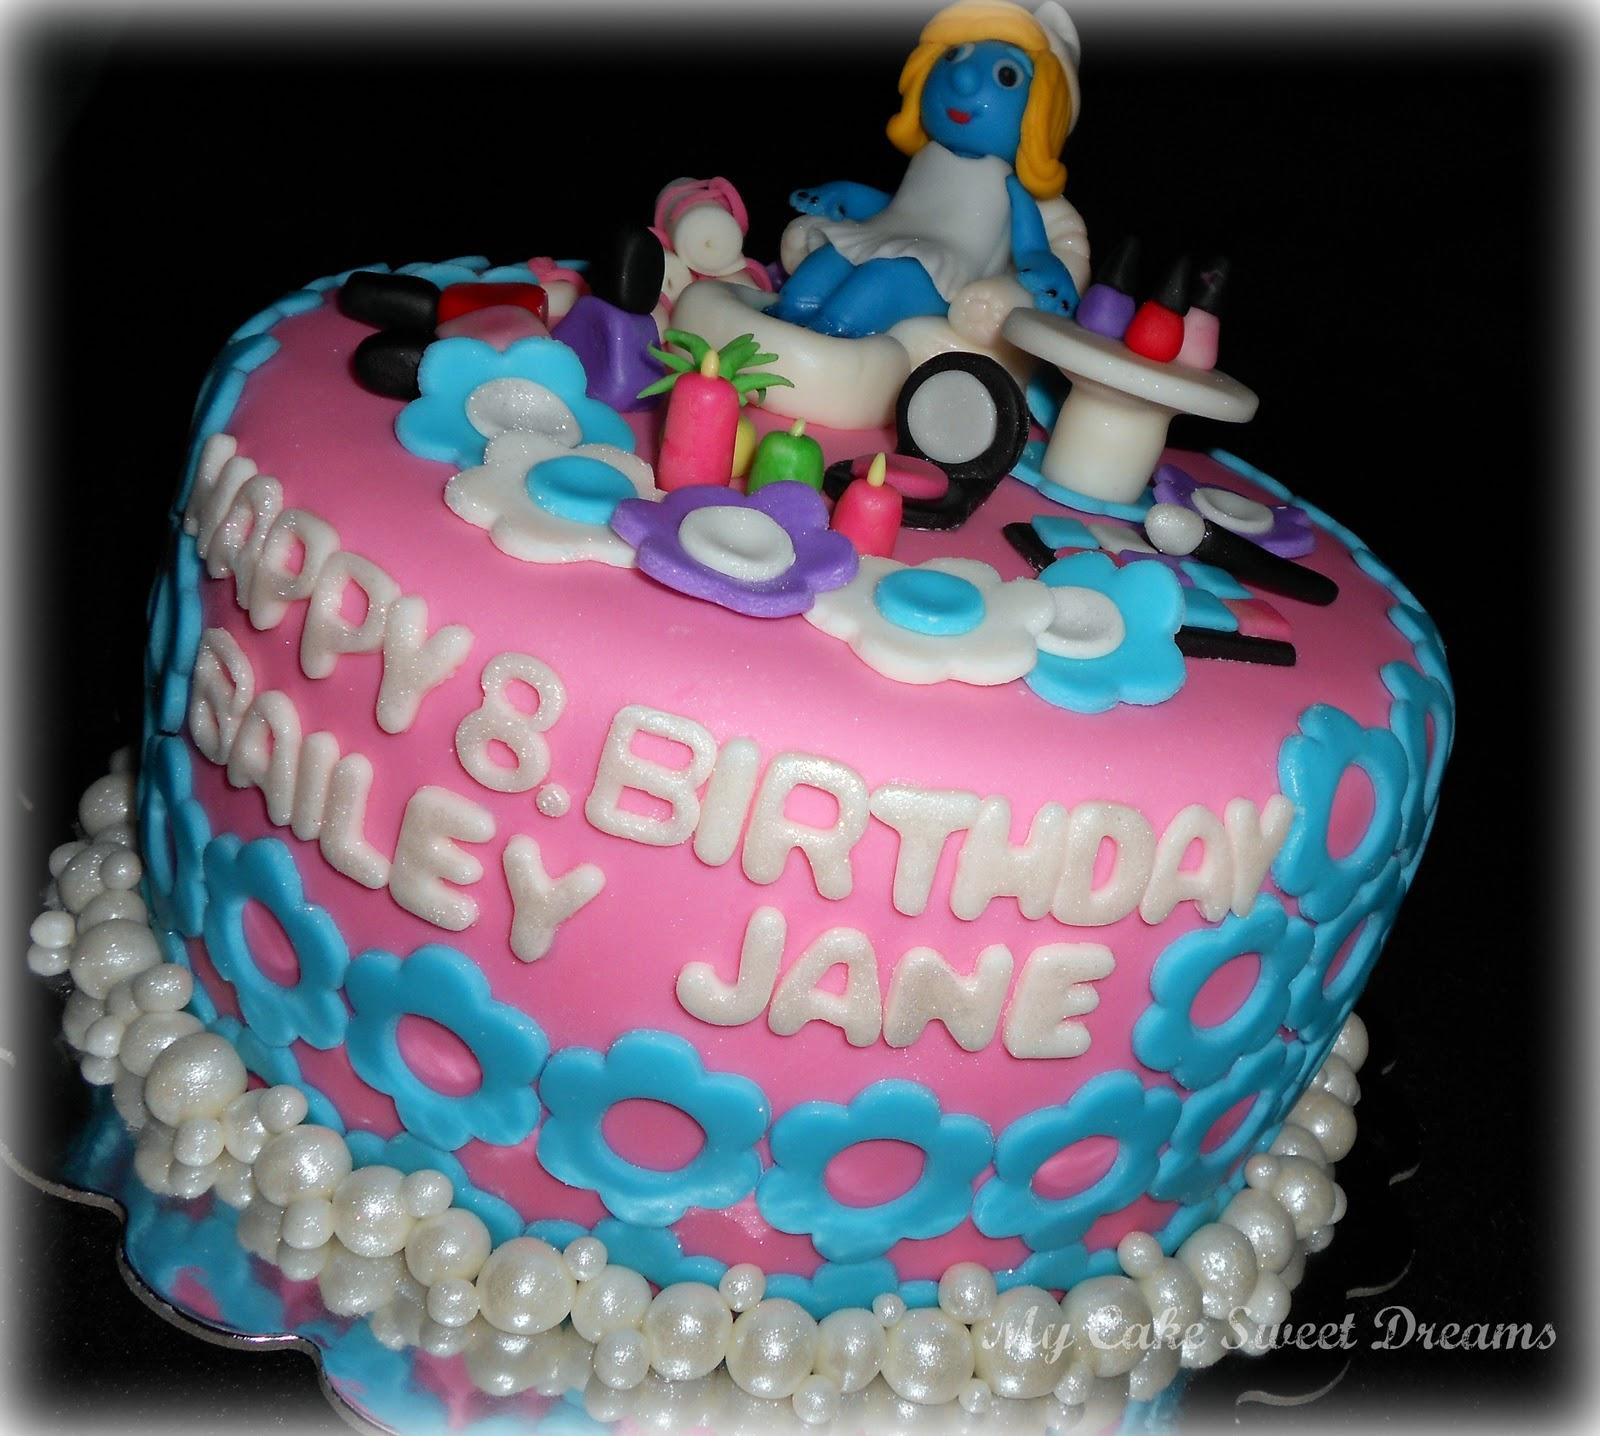 My Cake Sweet Dreams Spa Birthday Cake